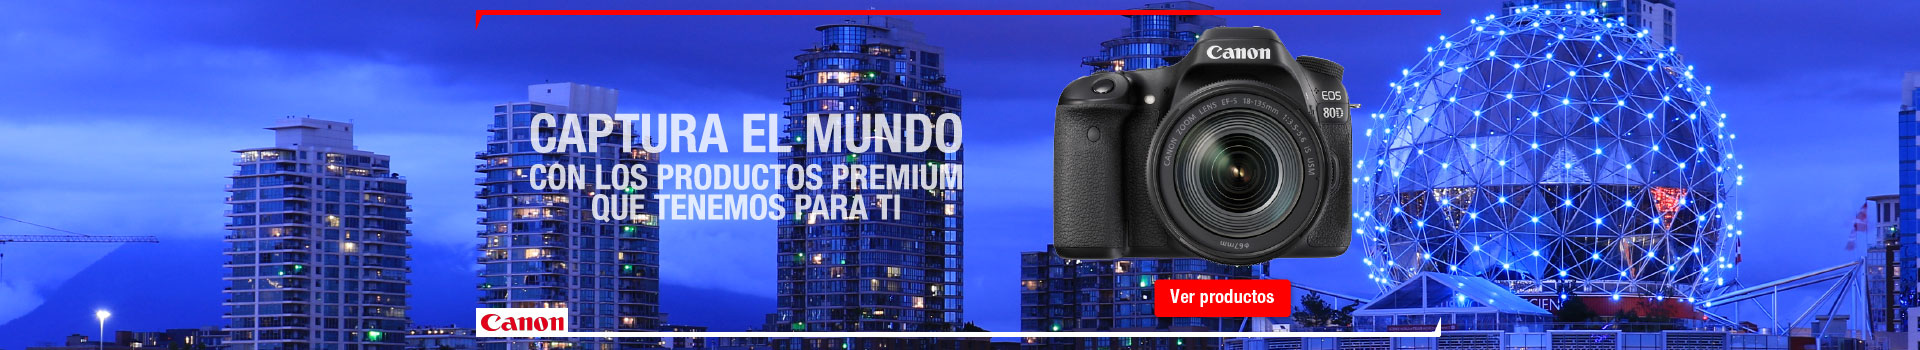 Bcat KT - Cámaras Premium CANON - Jul12